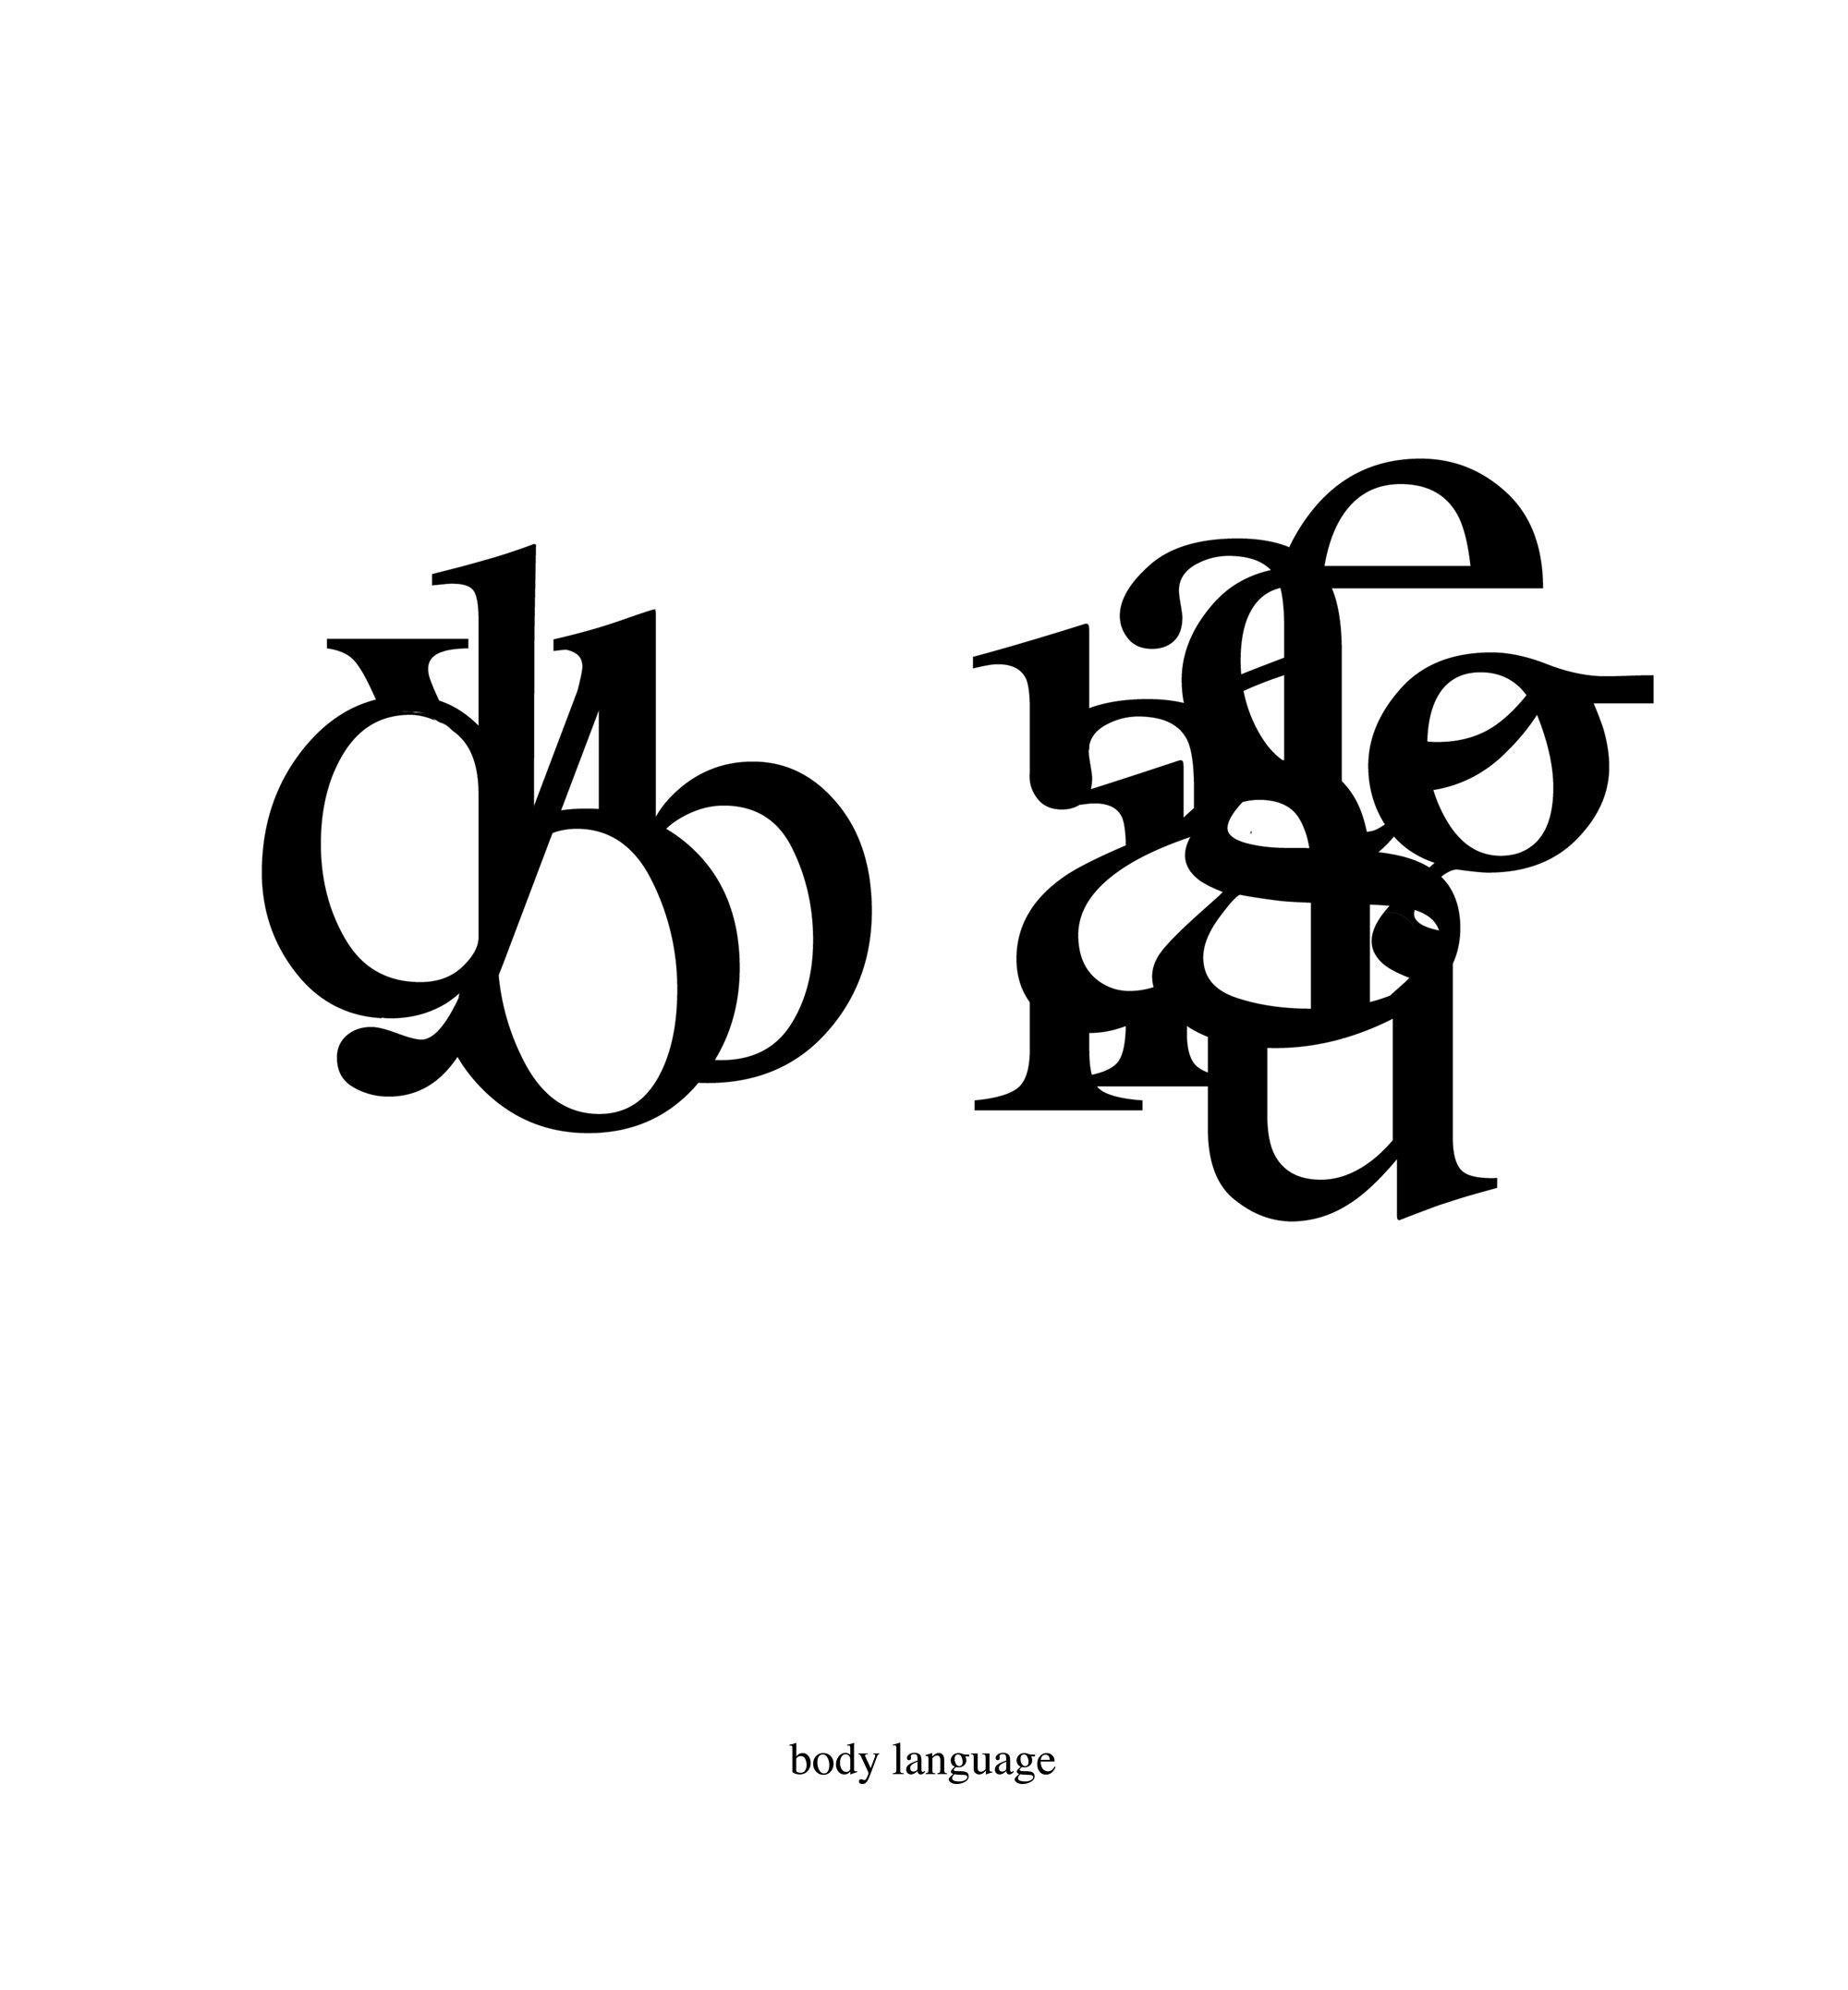 the gipher script - Giuseppe Furcolo\'s logoraphic writing system ...